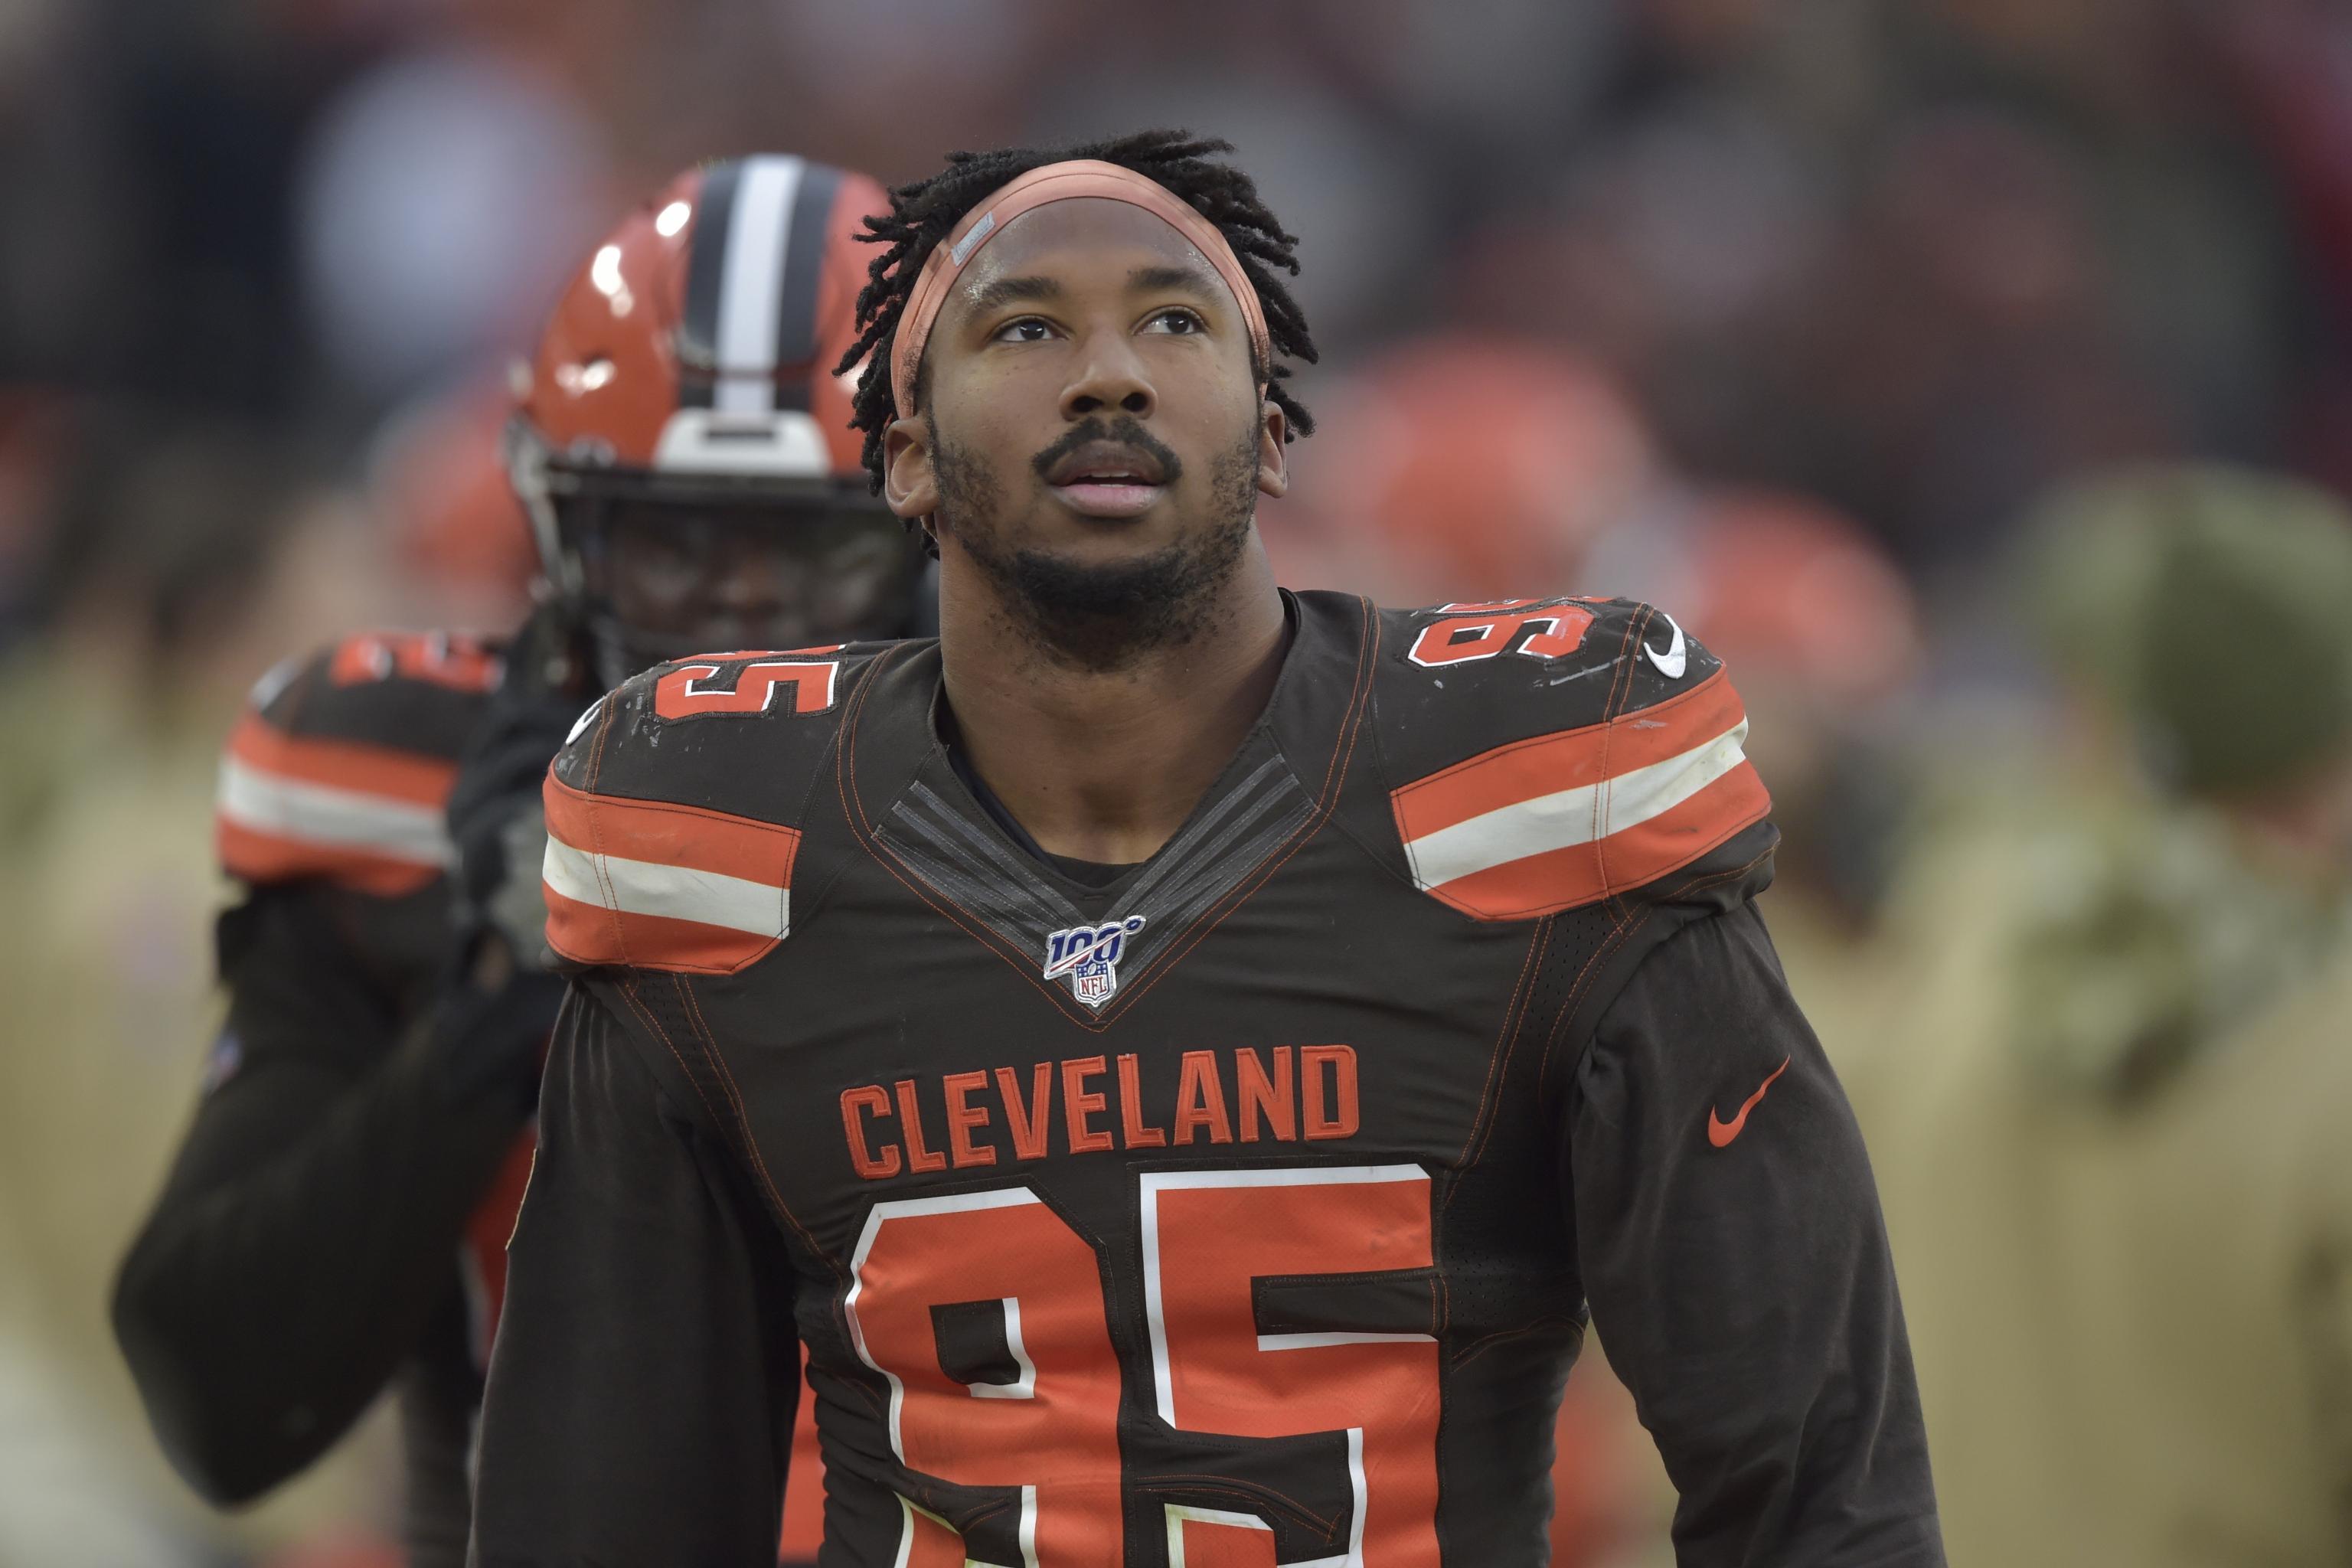 Browns' Myles Garrett Only 20 Top 20 Pick to Get 20 Contract ...